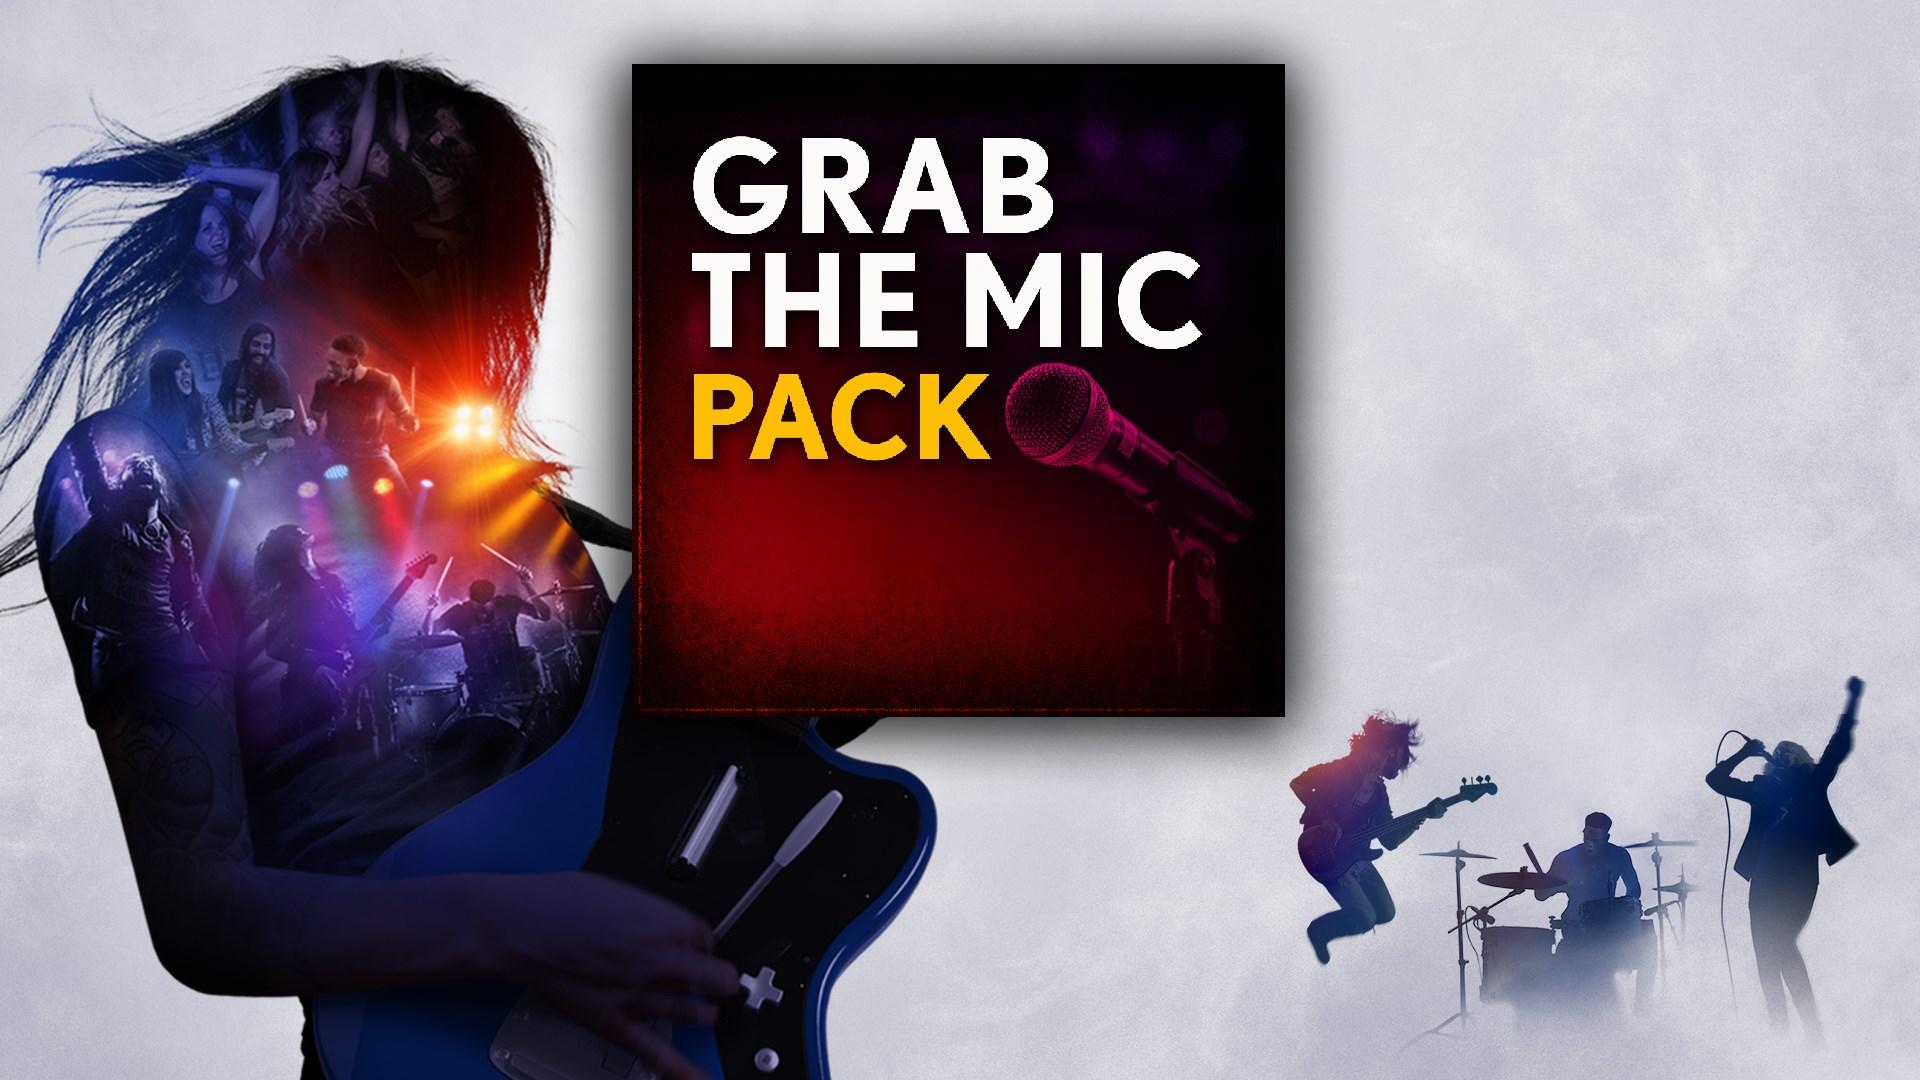 Grab The Mic Pack